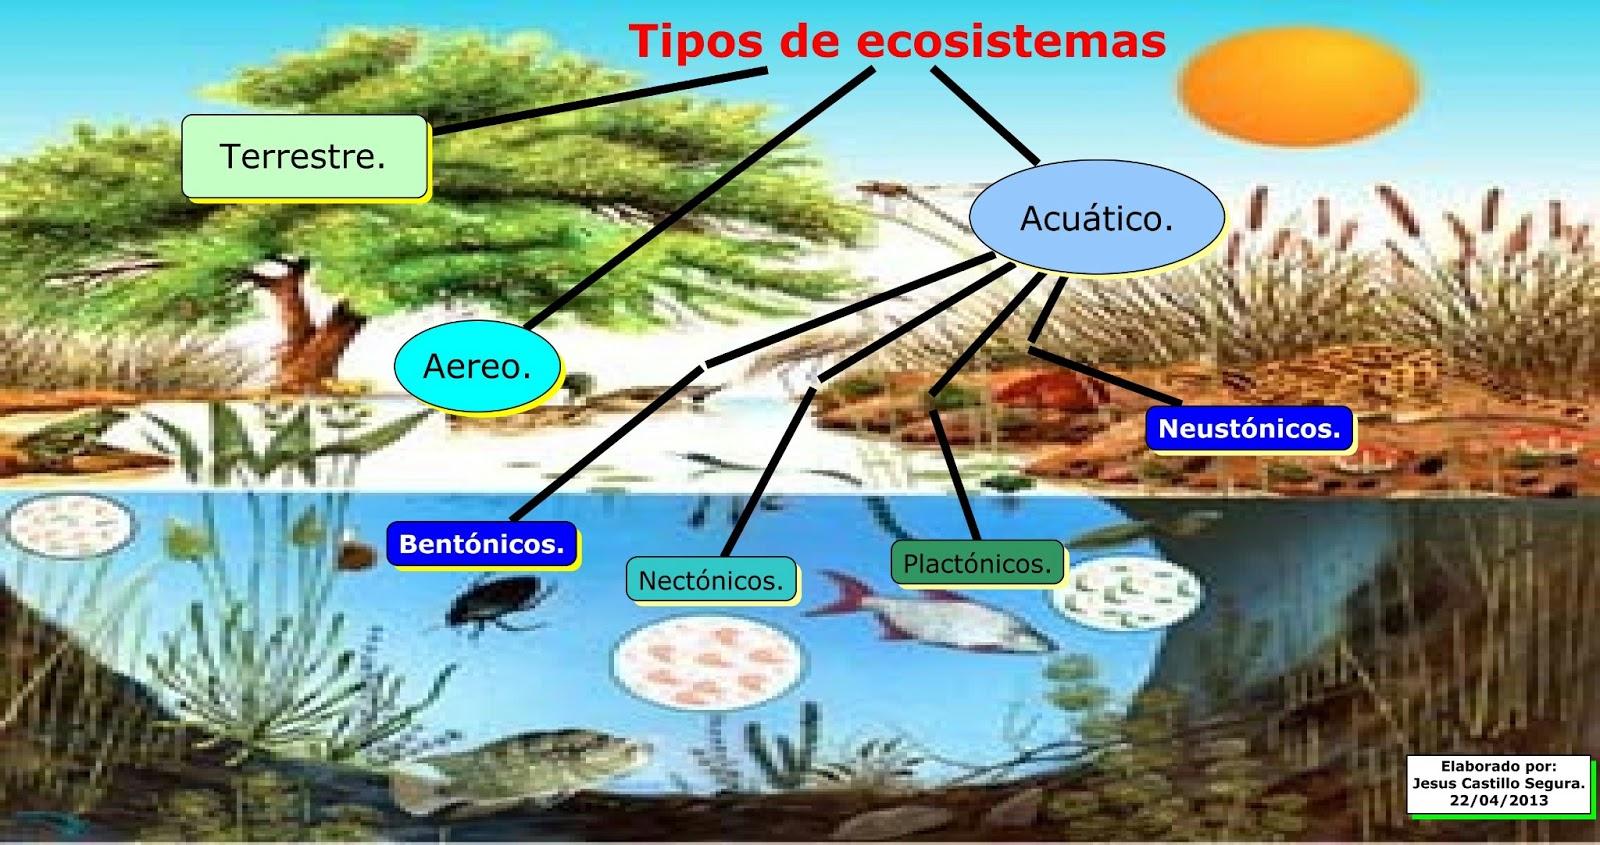 Maestro San Blas: Ecosistemas